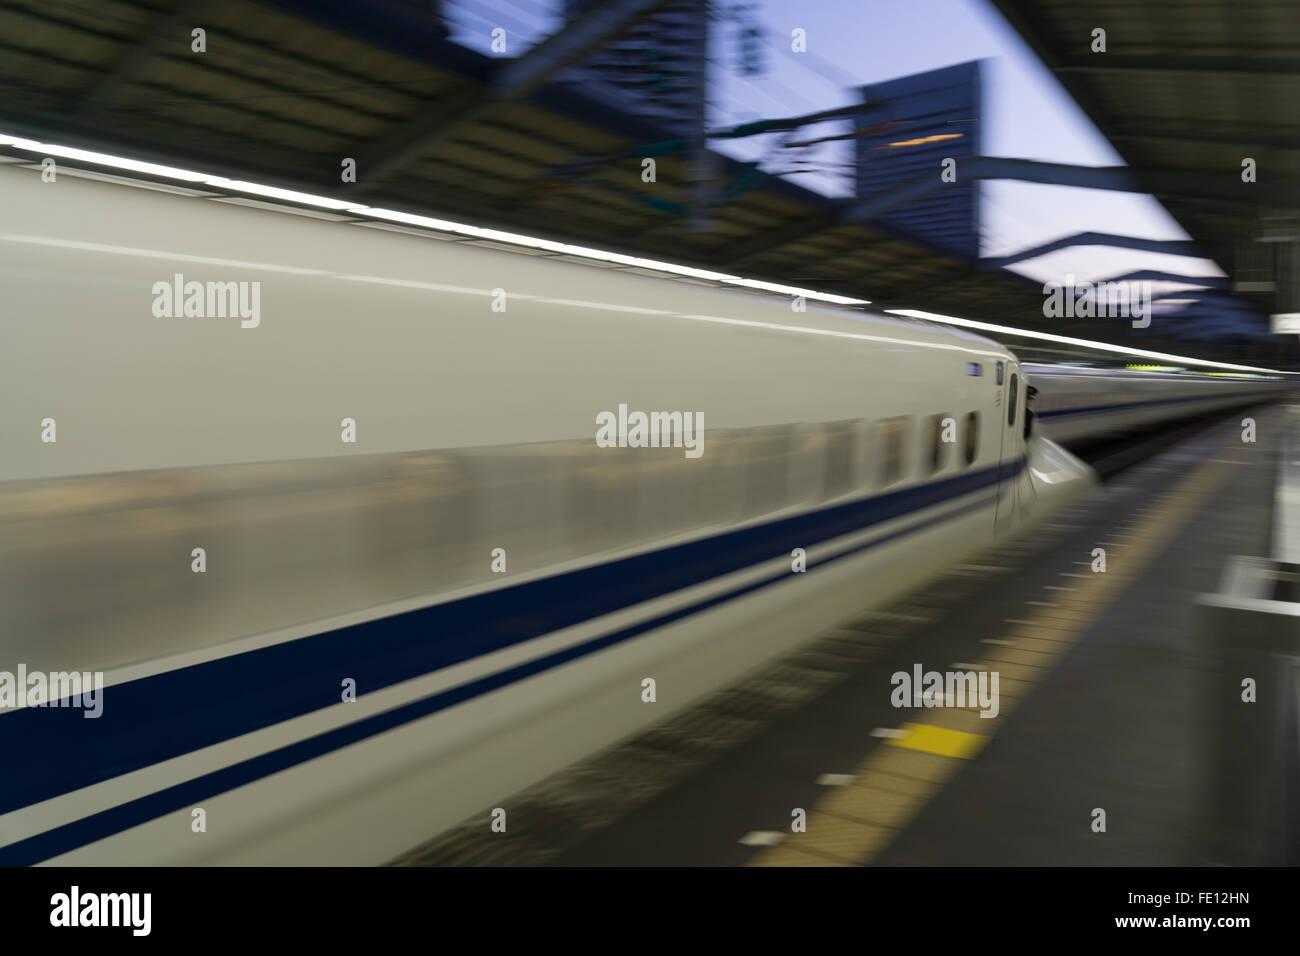 Shinkansen bullet train blurring in Japan - Stock Image